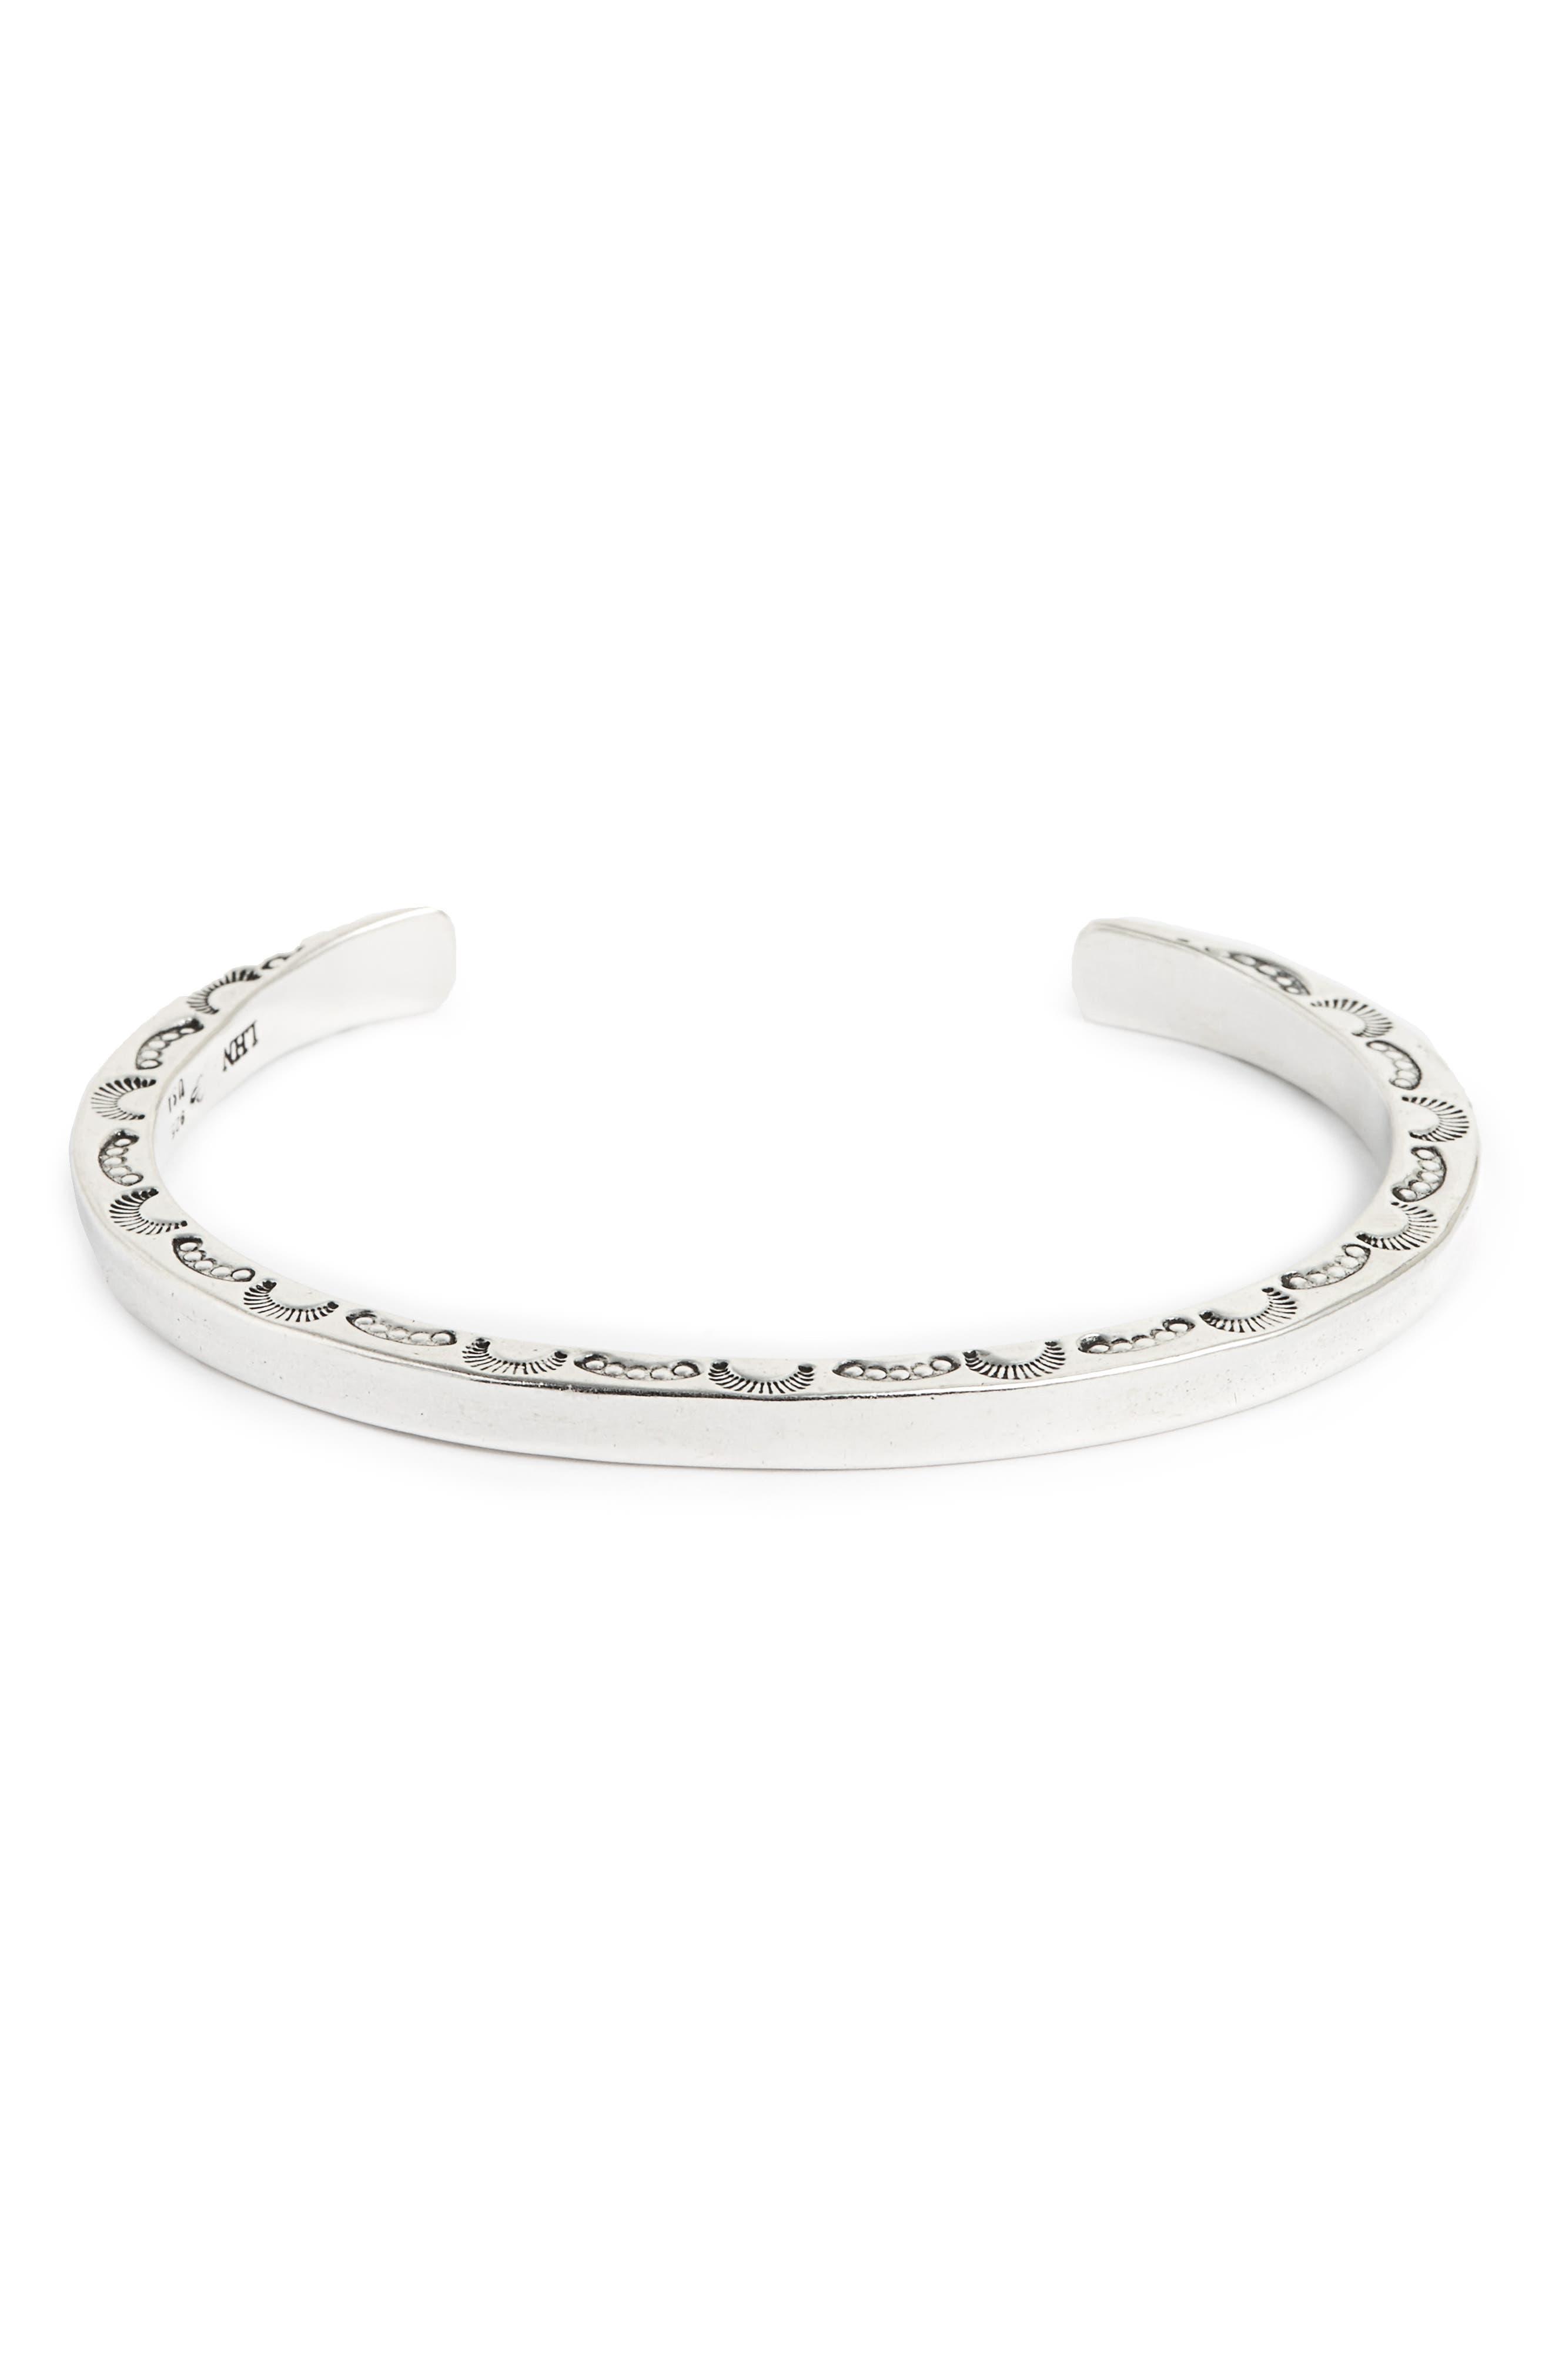 Sterling Silver Cuff Bracelet,                         Main,                         color, Silver